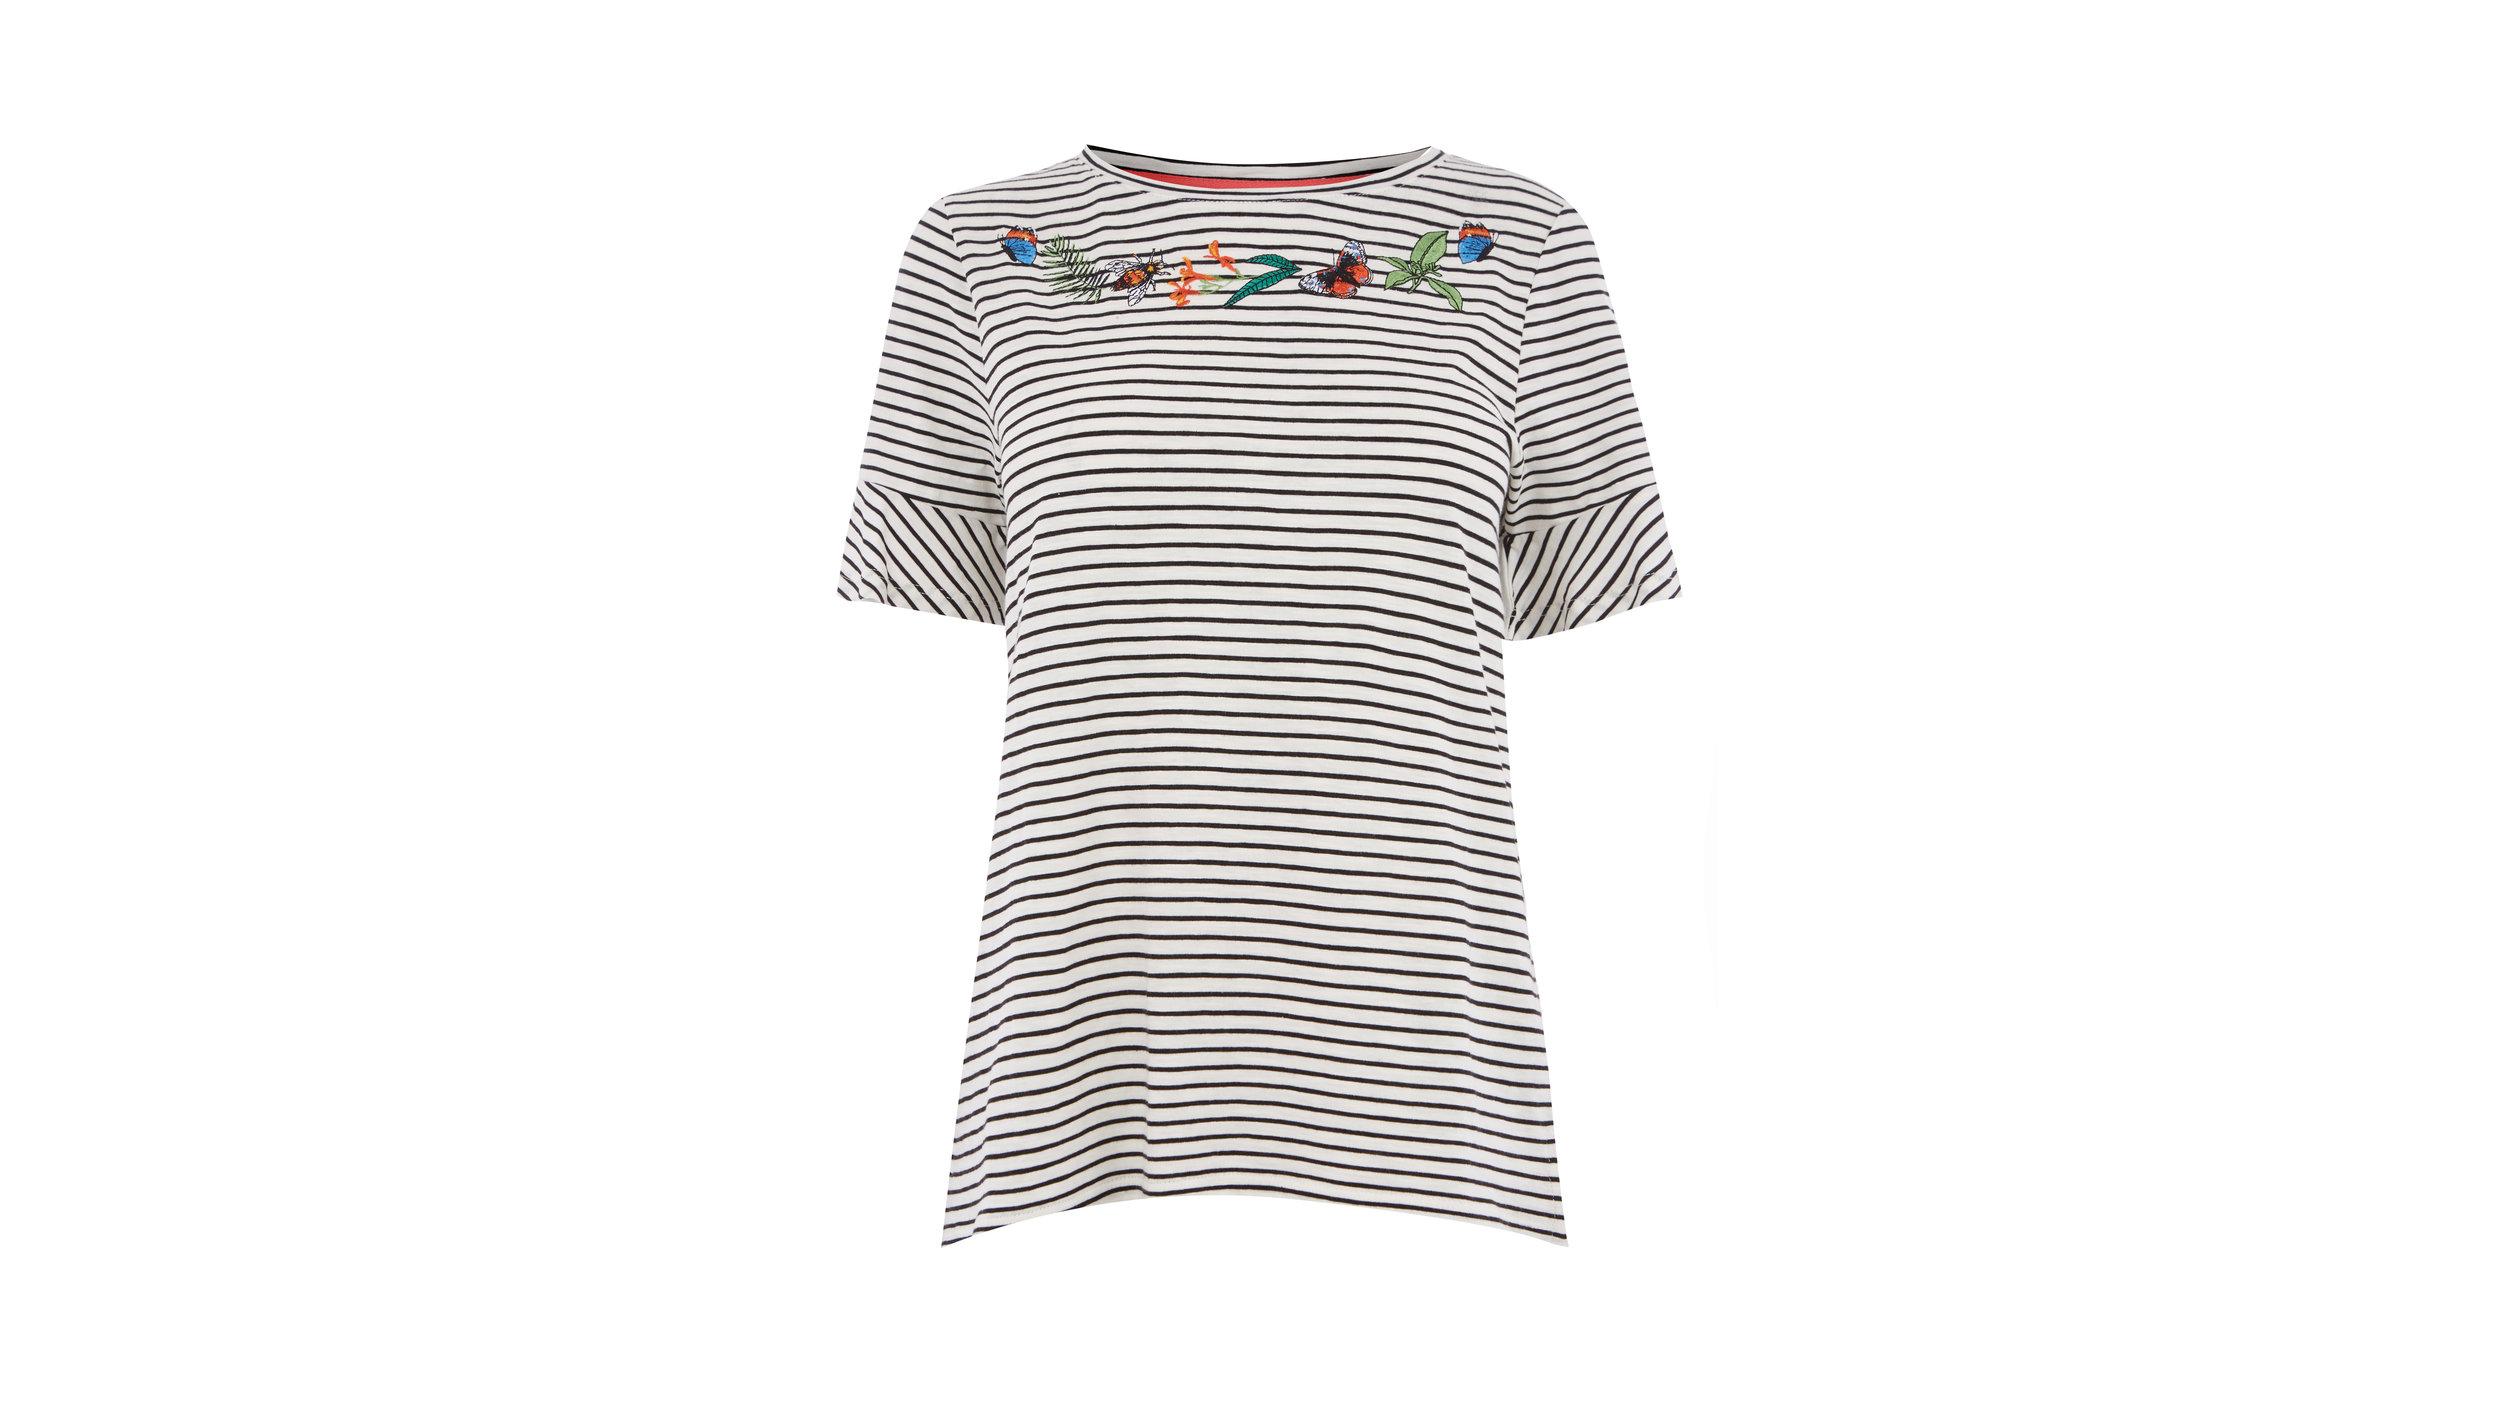 stripy-bug-tshirt-london-zoo-oasis-zsl